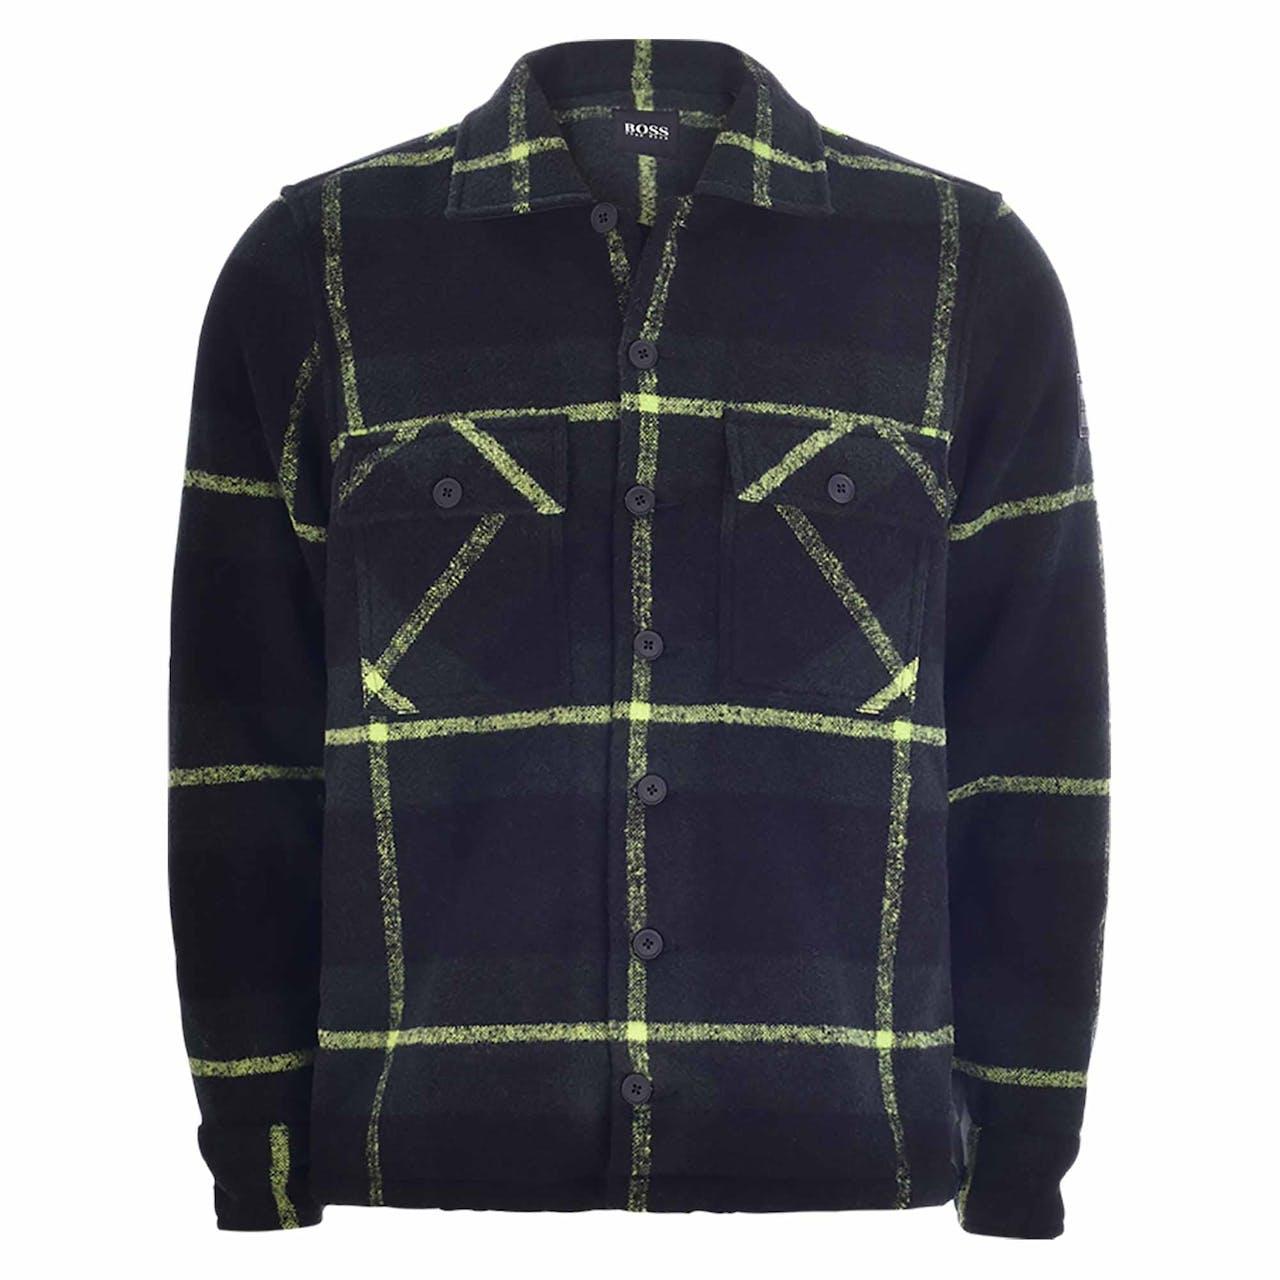 Overshirt - Loose Fit - Lom